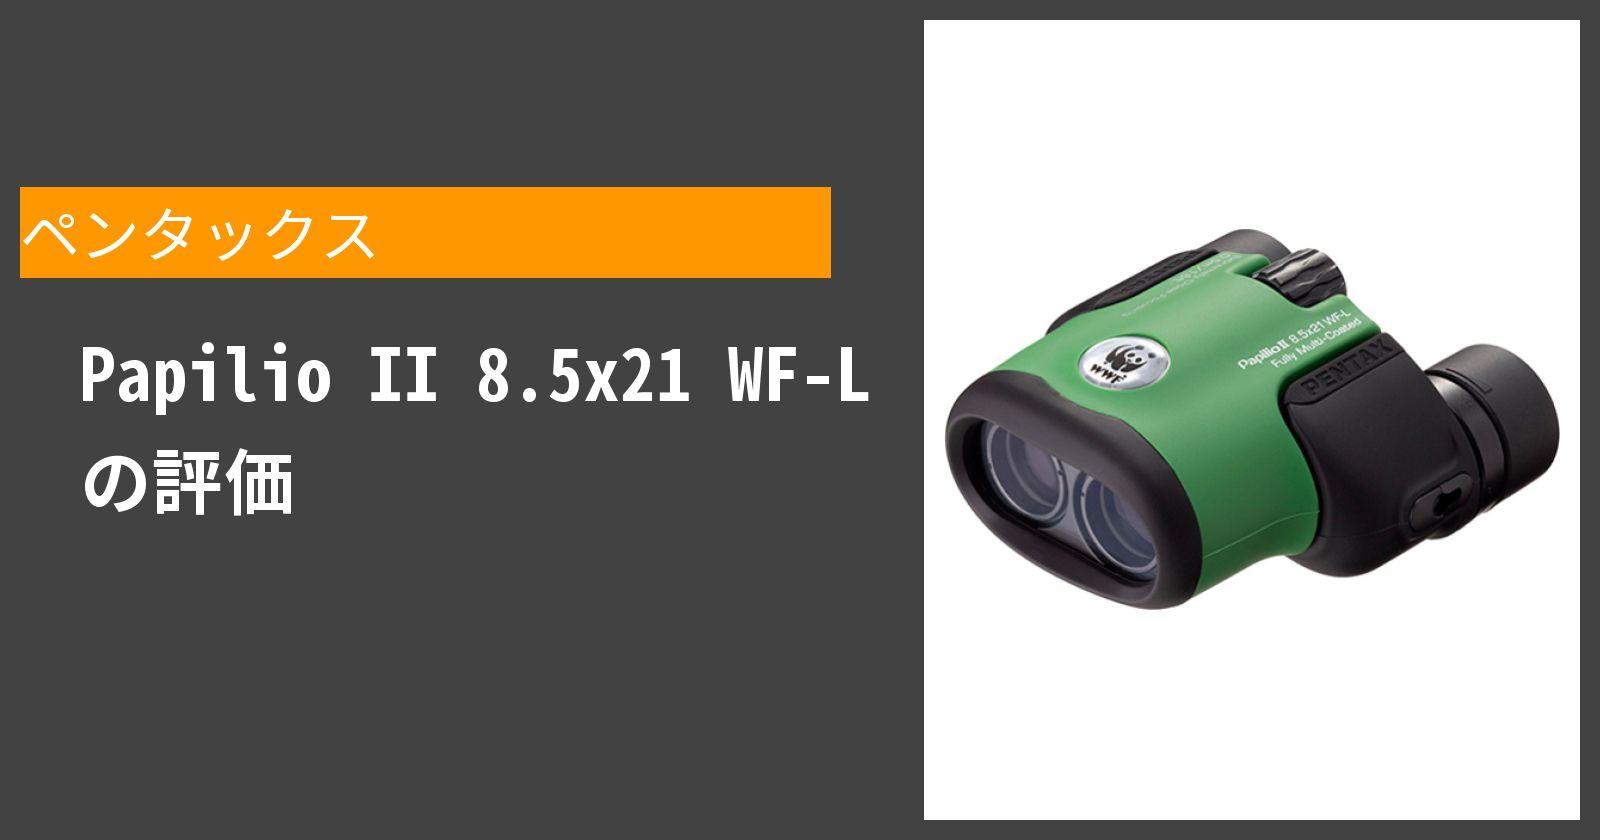 Papilio II 8.5x21 WF-Lを徹底評価